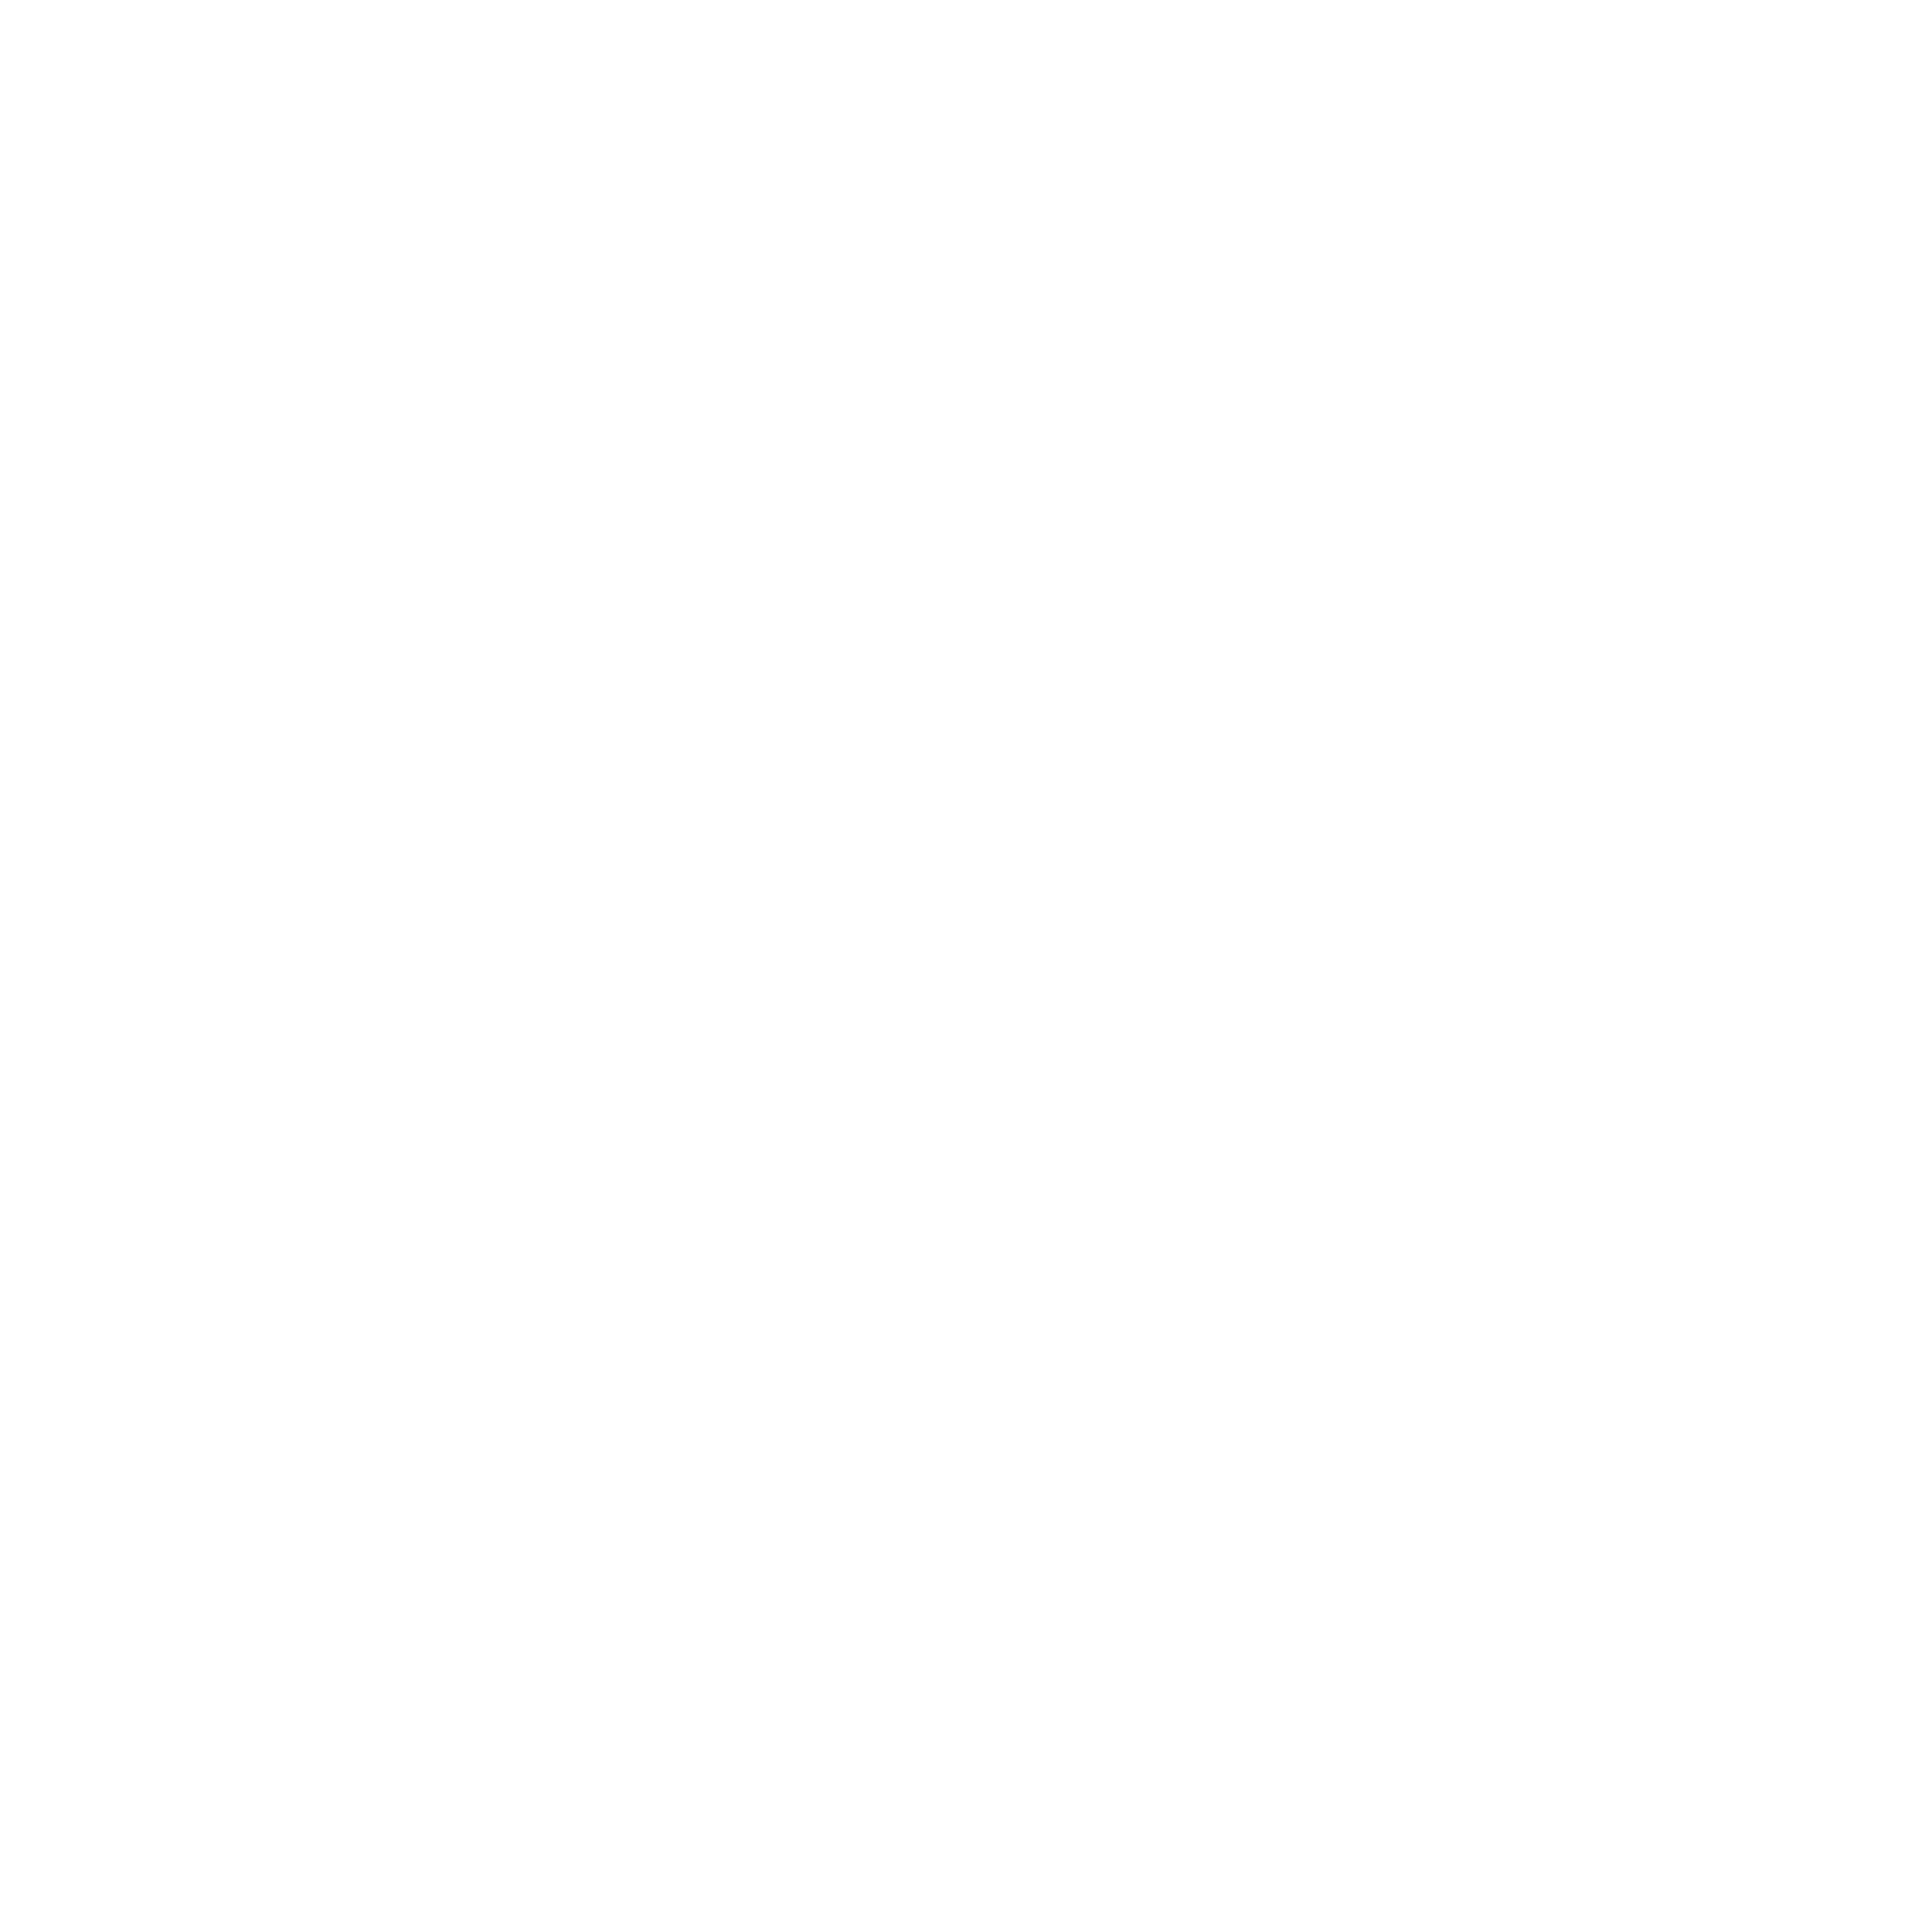 Leonardo Angelucci